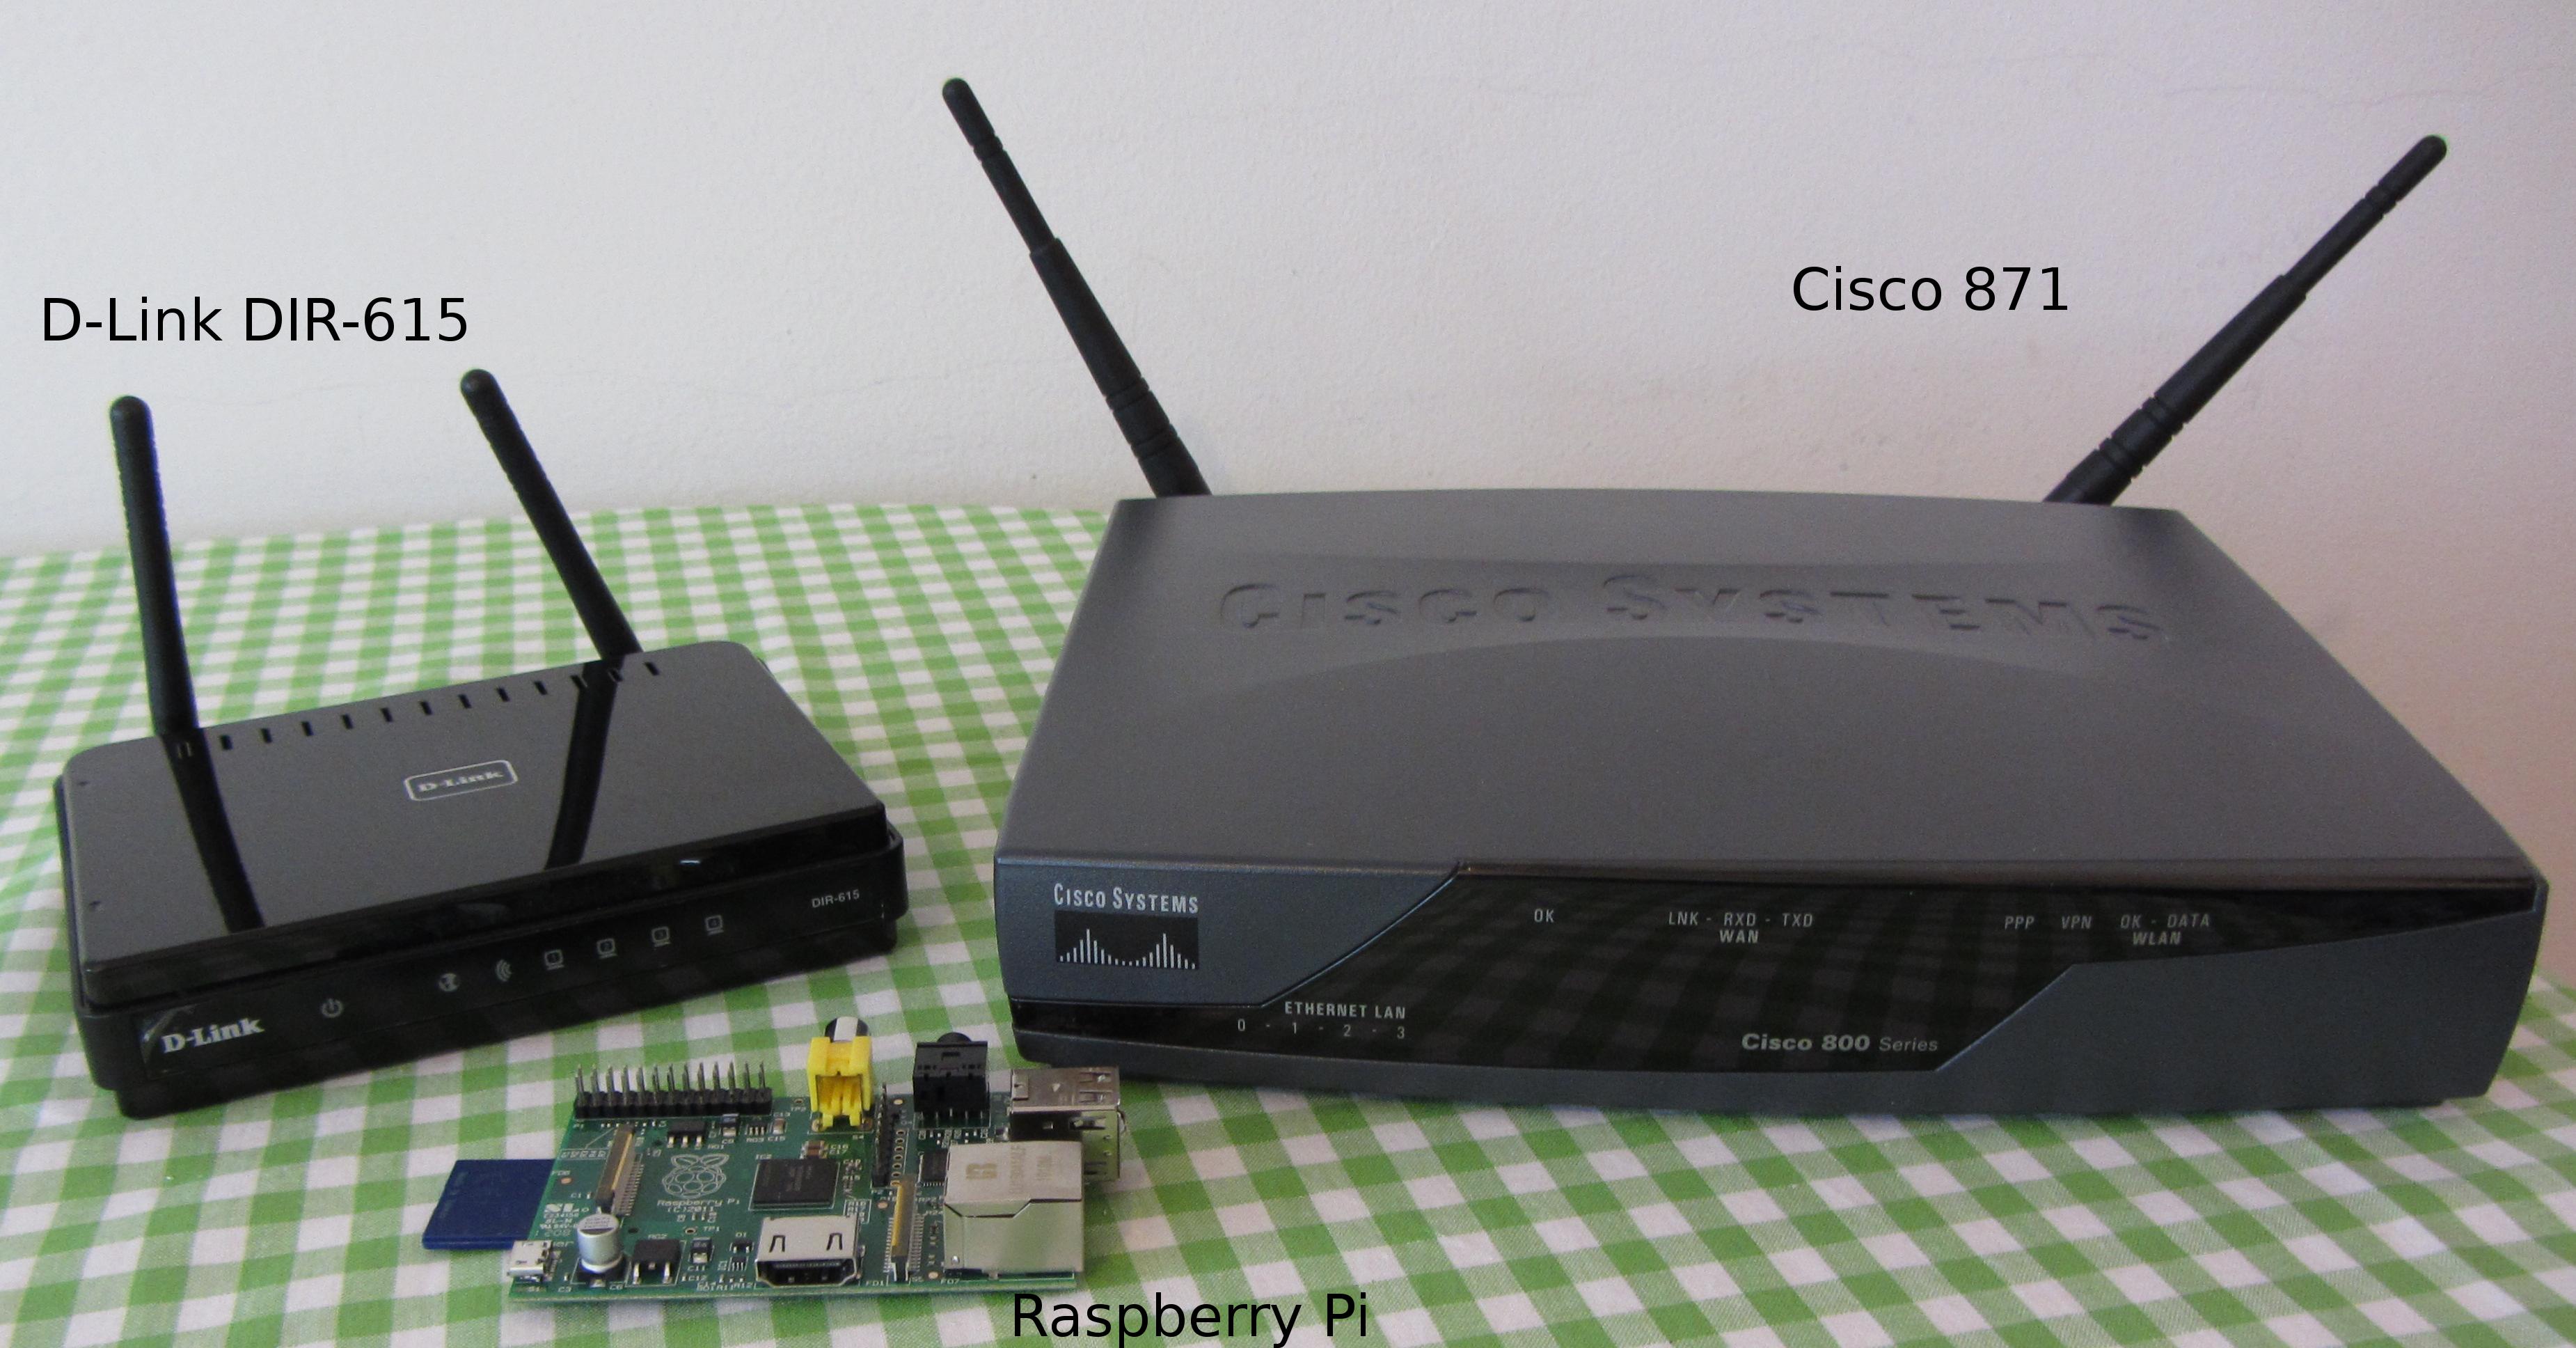 Wpa 2 Enterprise From Scratch Using A Raspberry Pi Michiel S 0s 1s